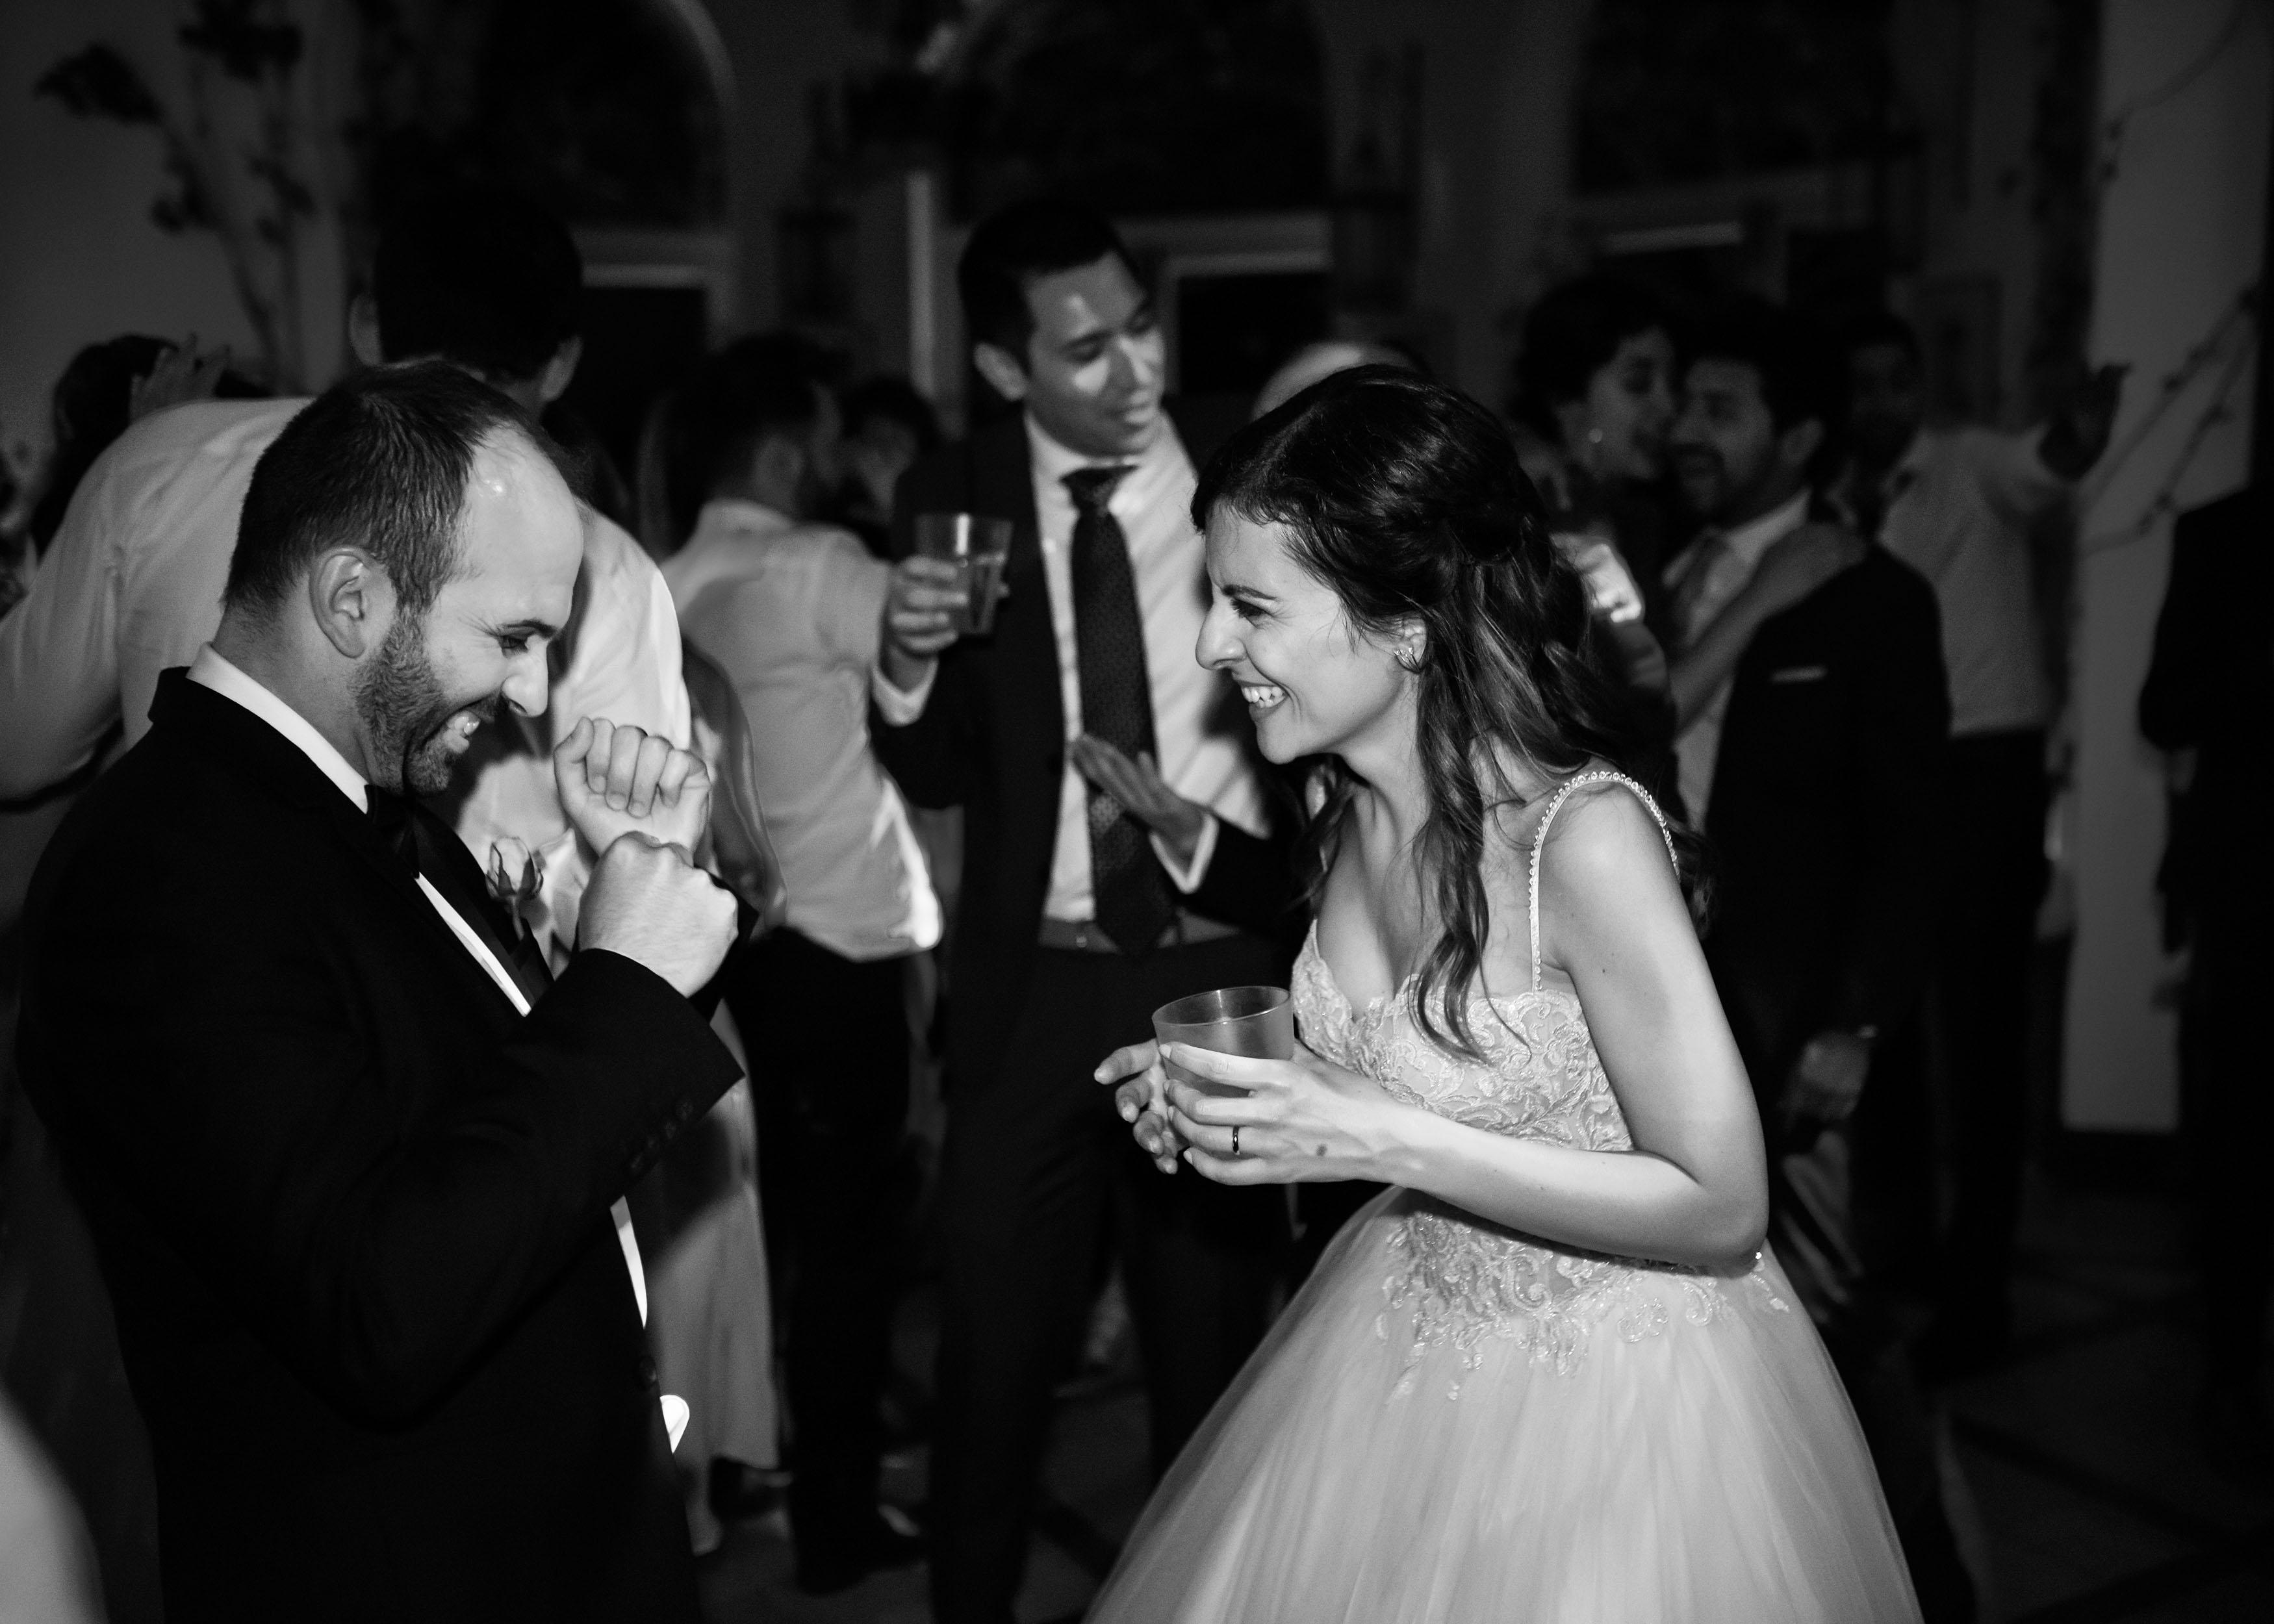 https://www.weddingamalfi.com/wp-content/uploads/Katia-Jorge-18-maggio-2019-47.jpg